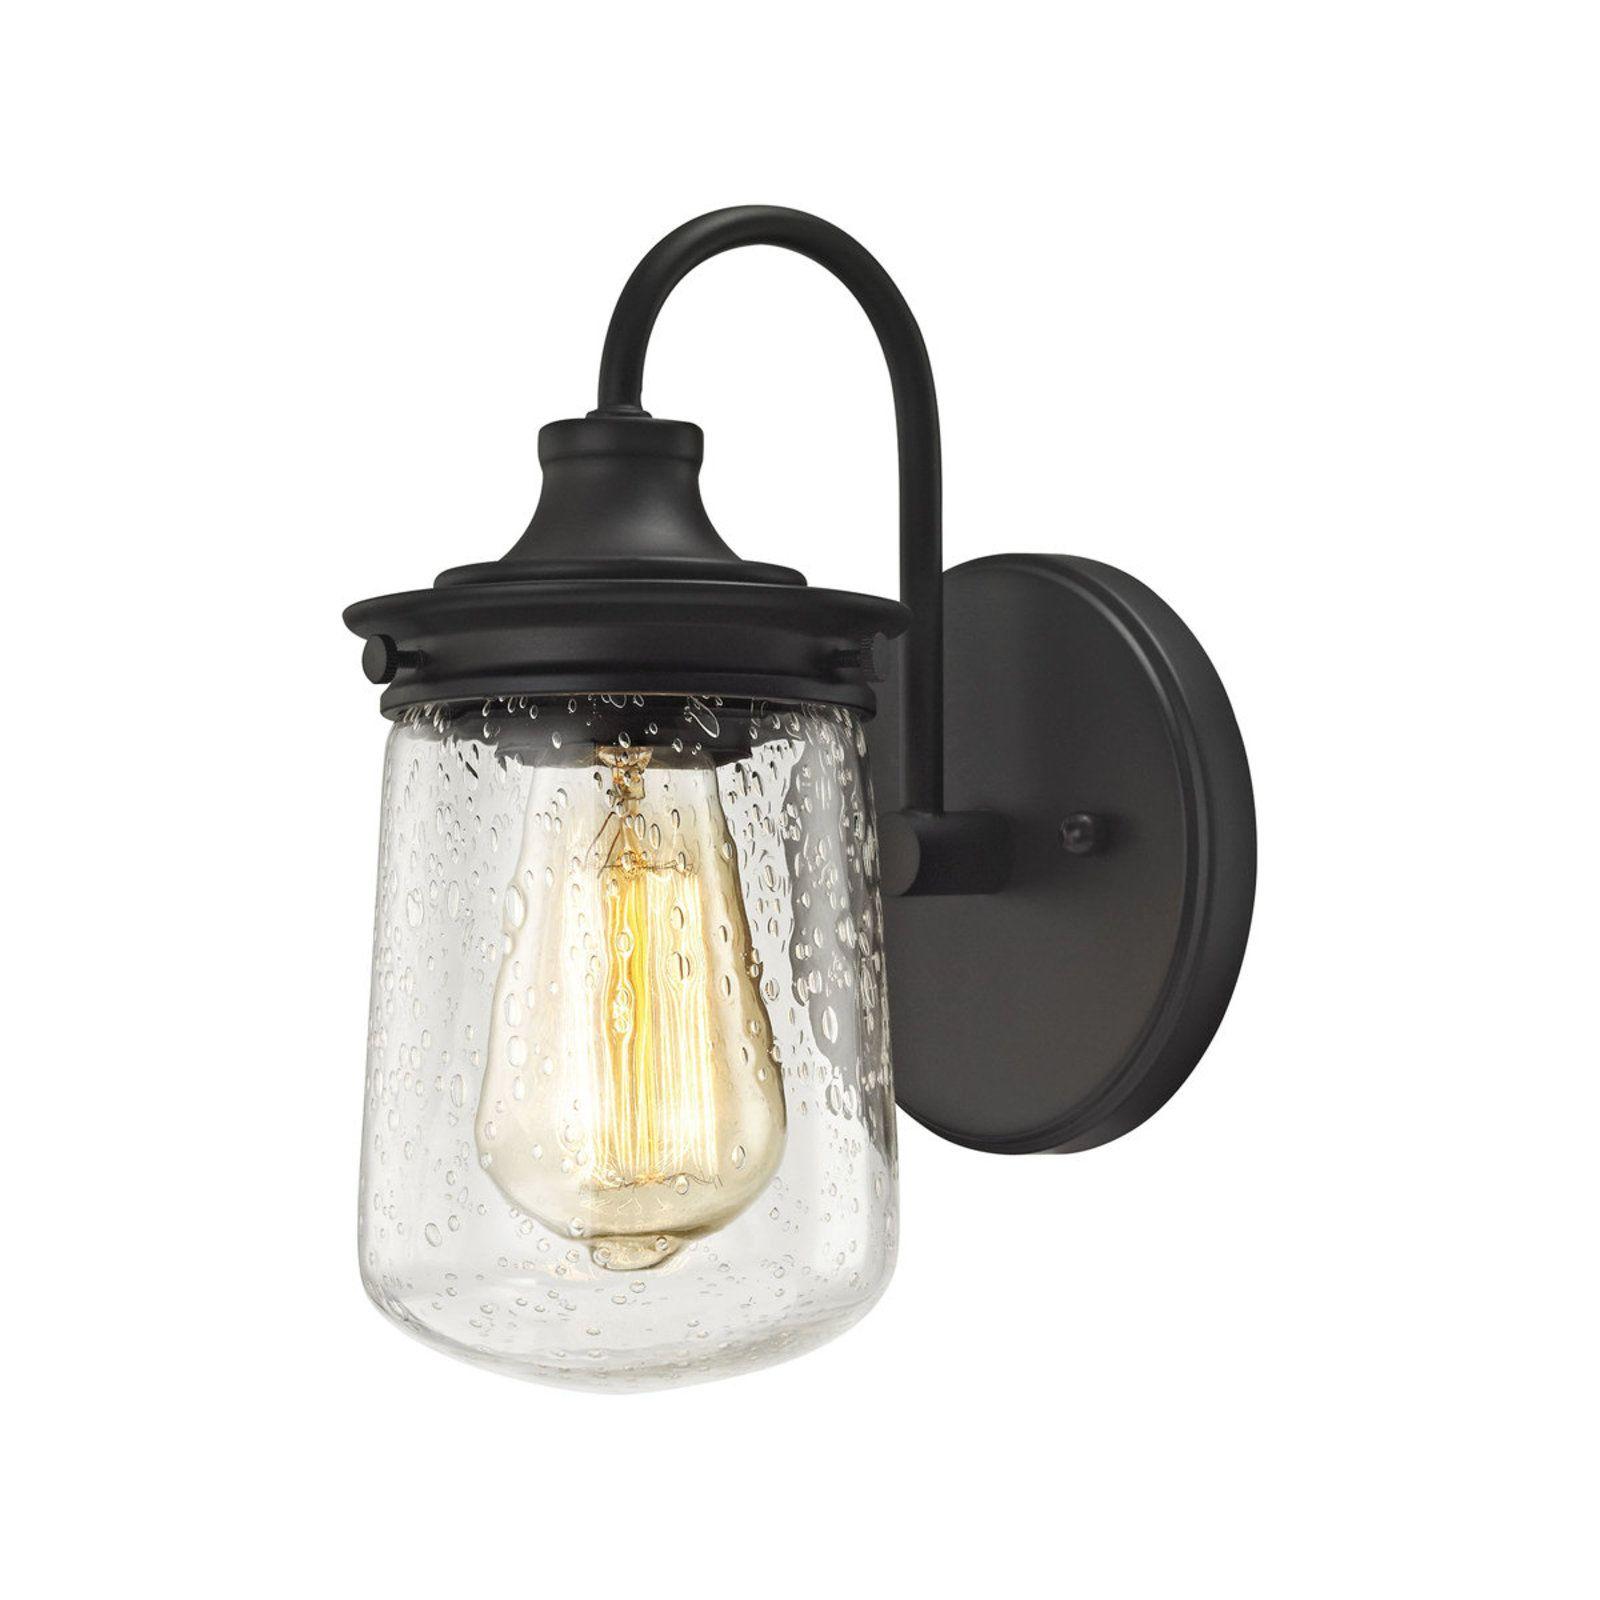 Jar Glass Seeded Sconce Elk lighting, Oil rubbed bronze